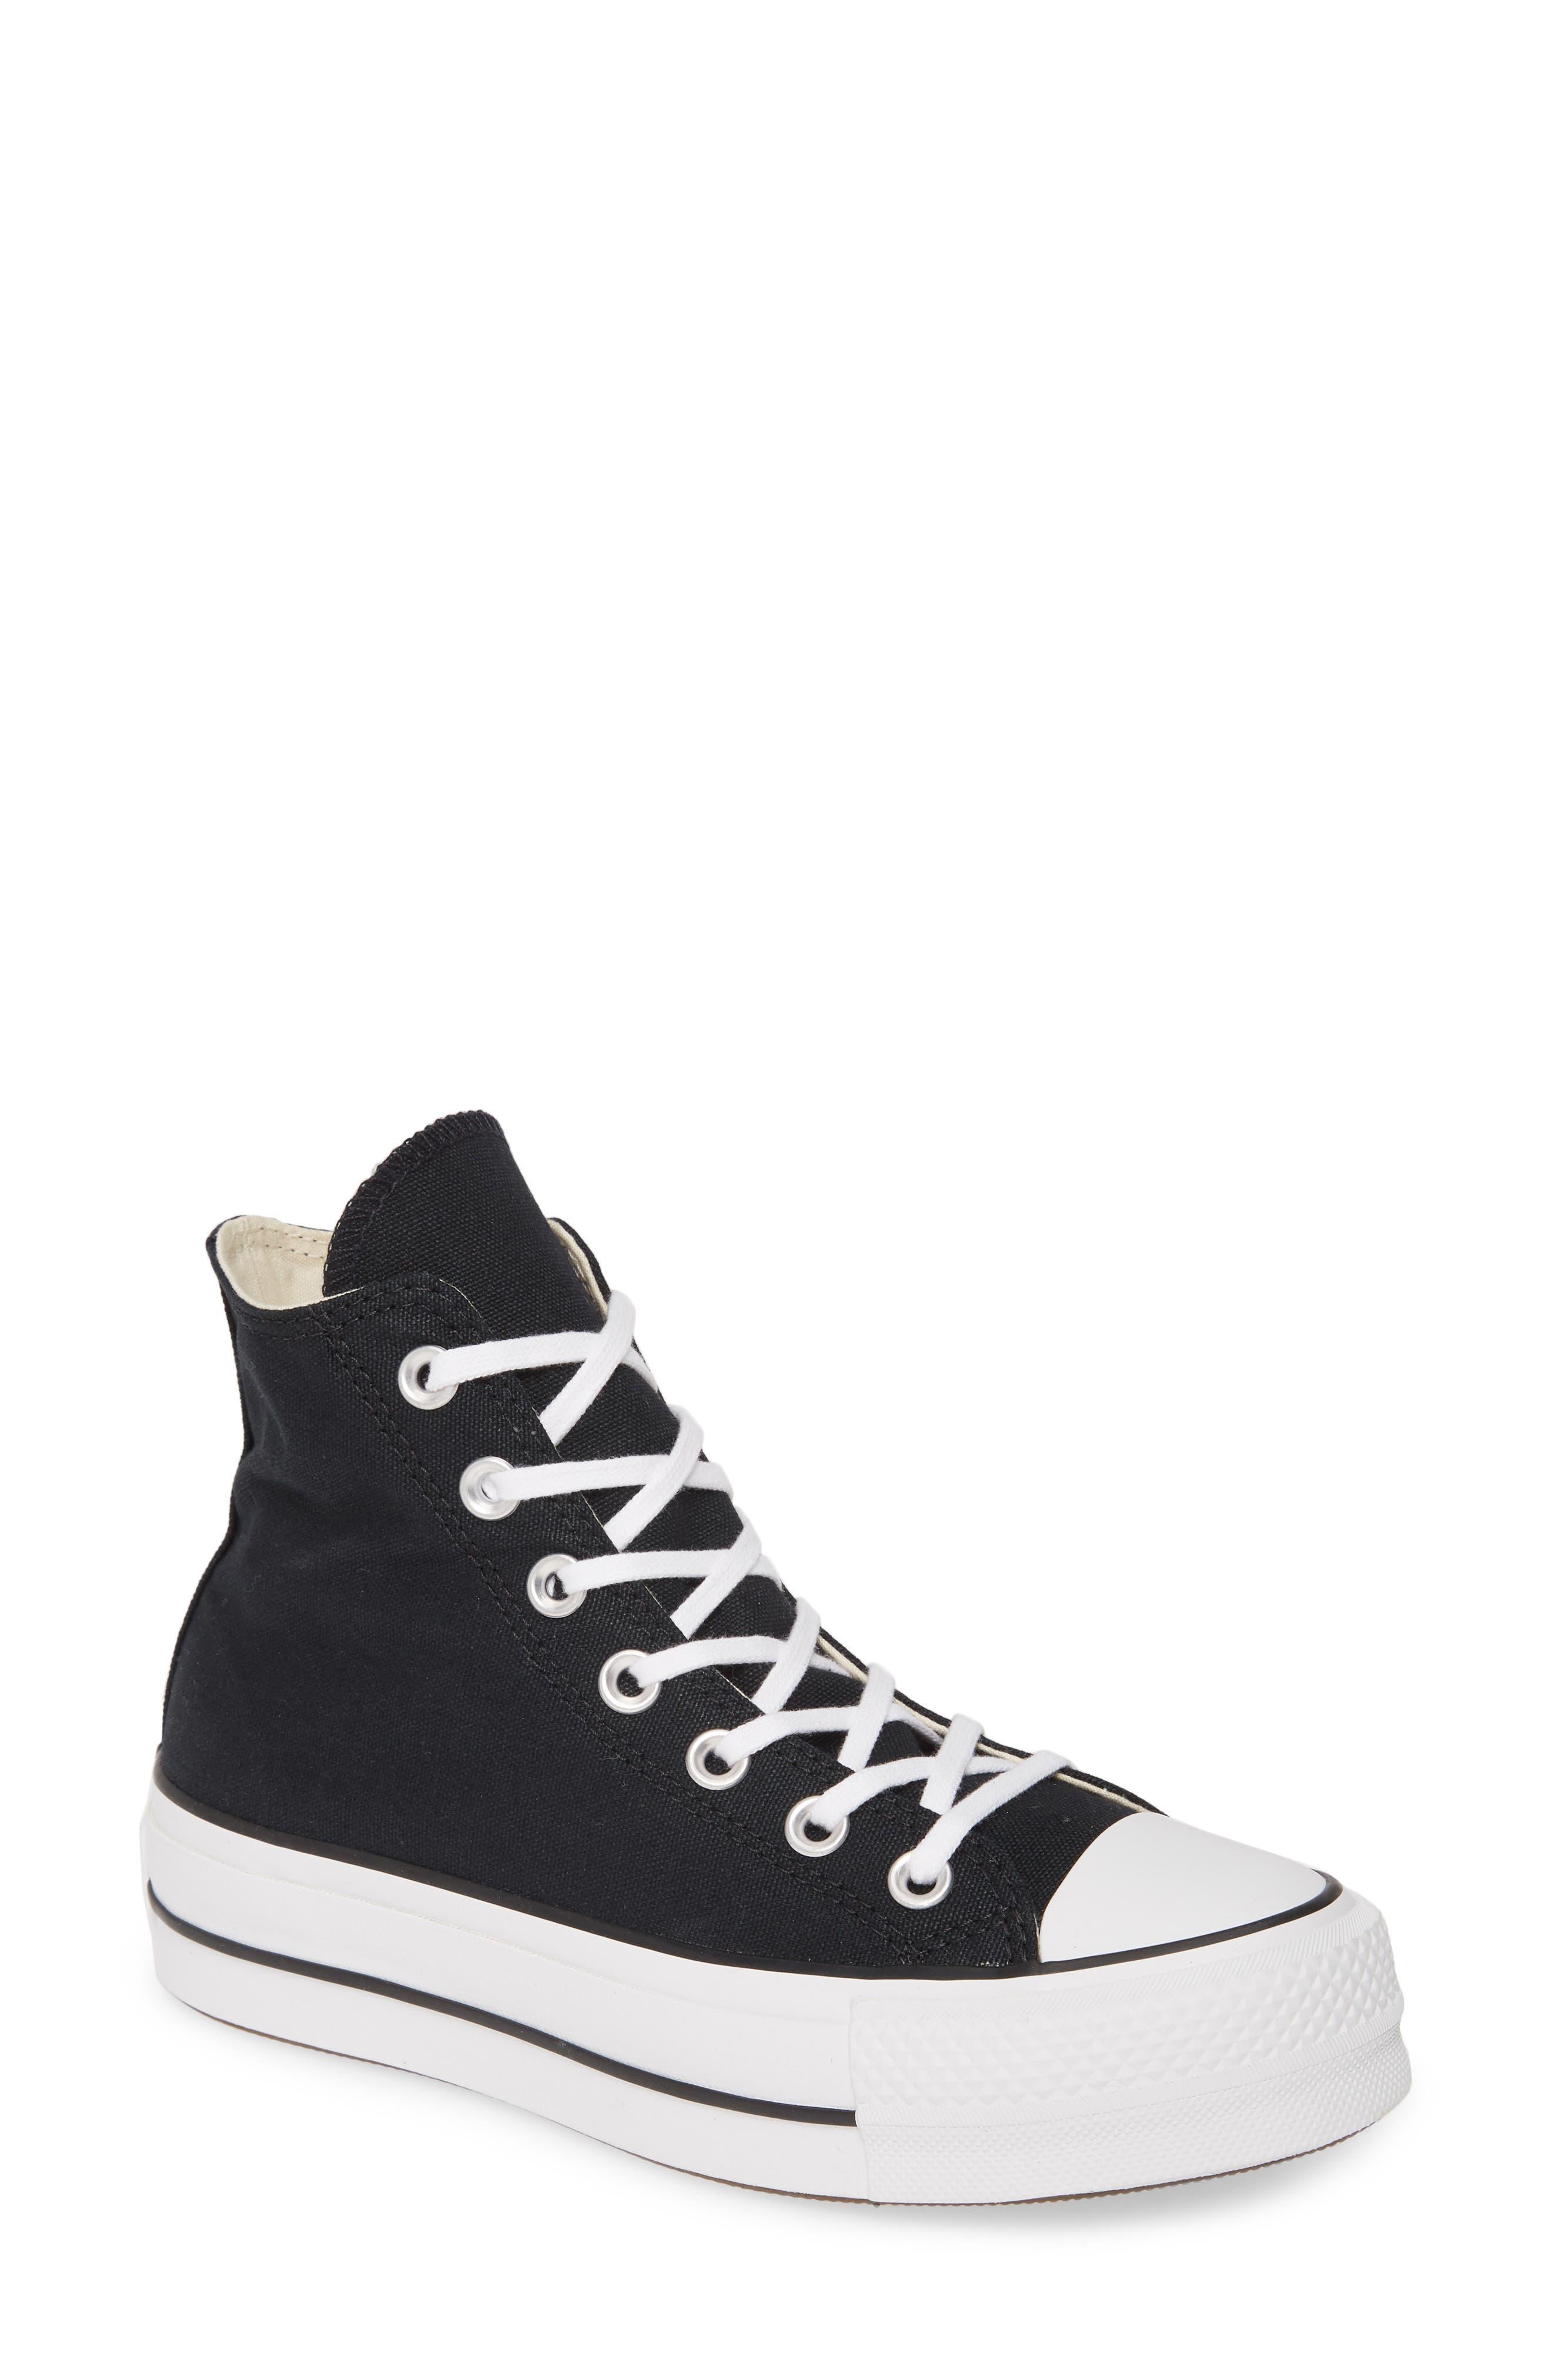 Converse Chuck Taylor All Star Lift High Top Platform Sneaker- Black